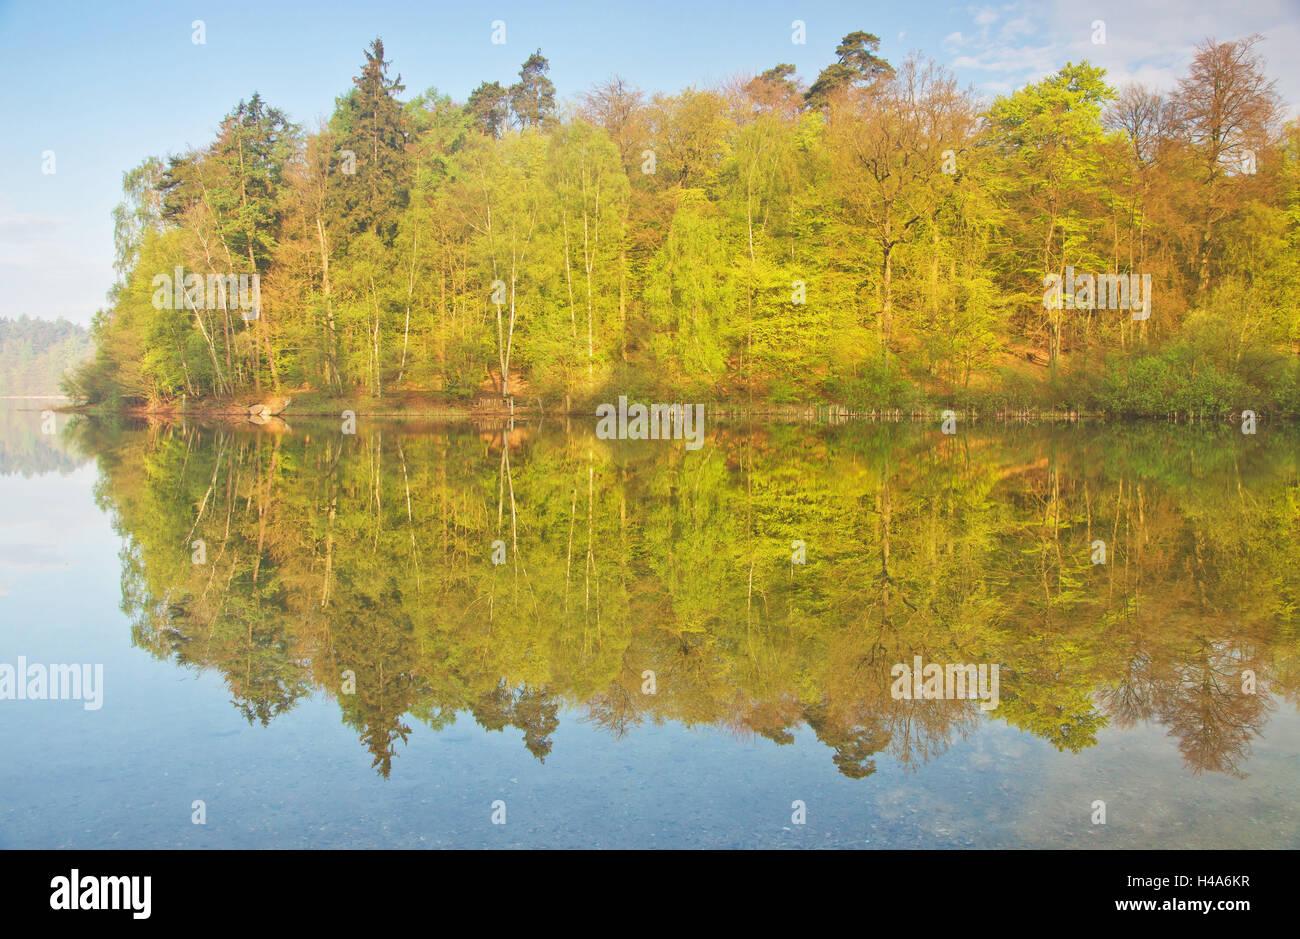 Garrensee, water reflexion, - Stock Image